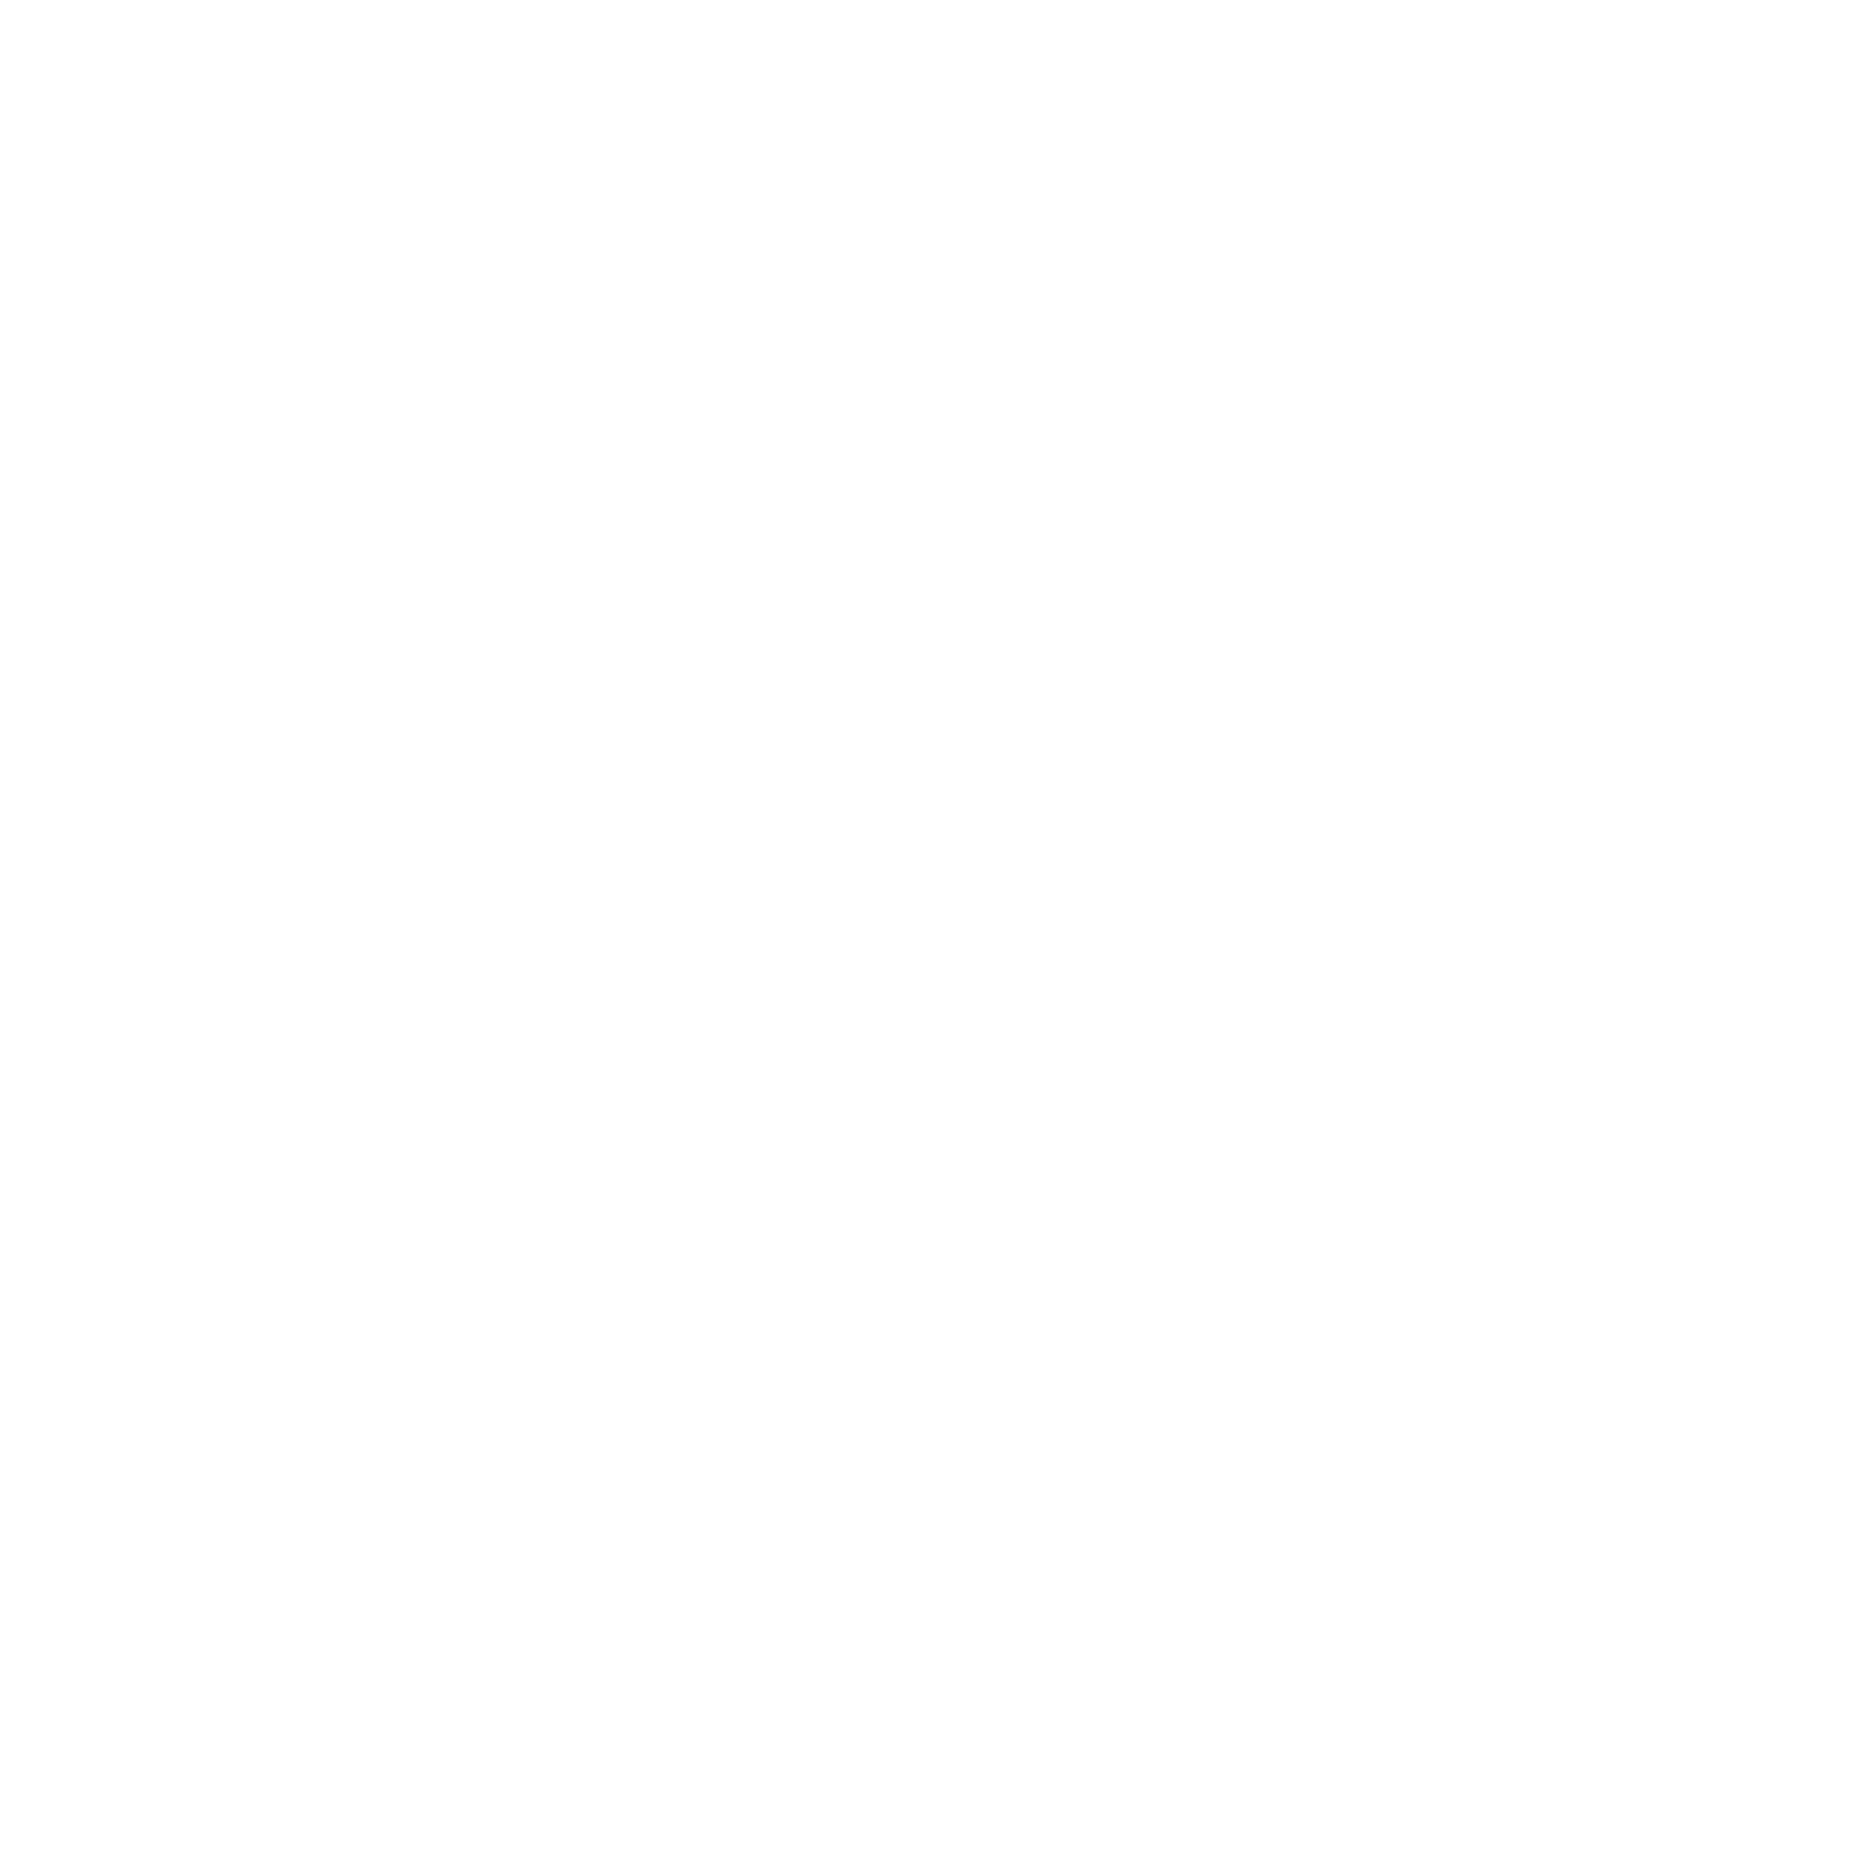 Sanford-Wine-Walk-LOGO-TRIMMED-WHITE.png